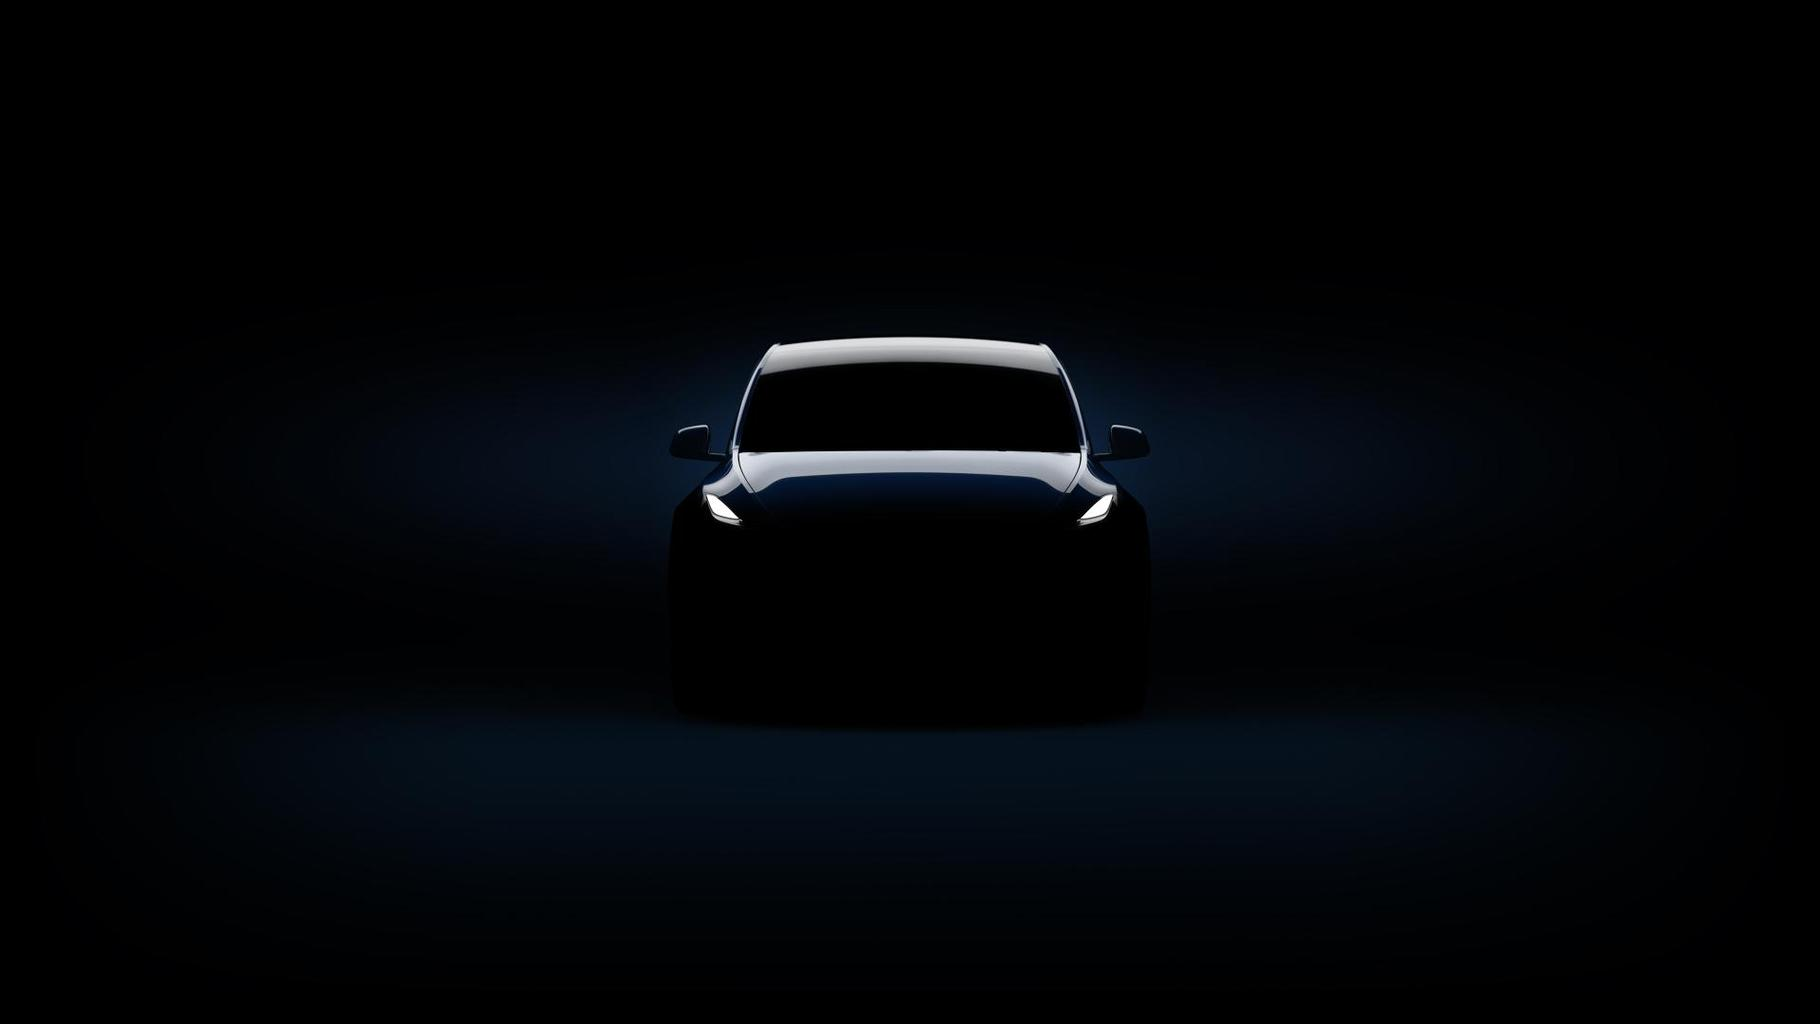 Tesla Fremont steigert Produktion des Model 3 & Y auf 500.000 pro Jahr bis Ende 2020